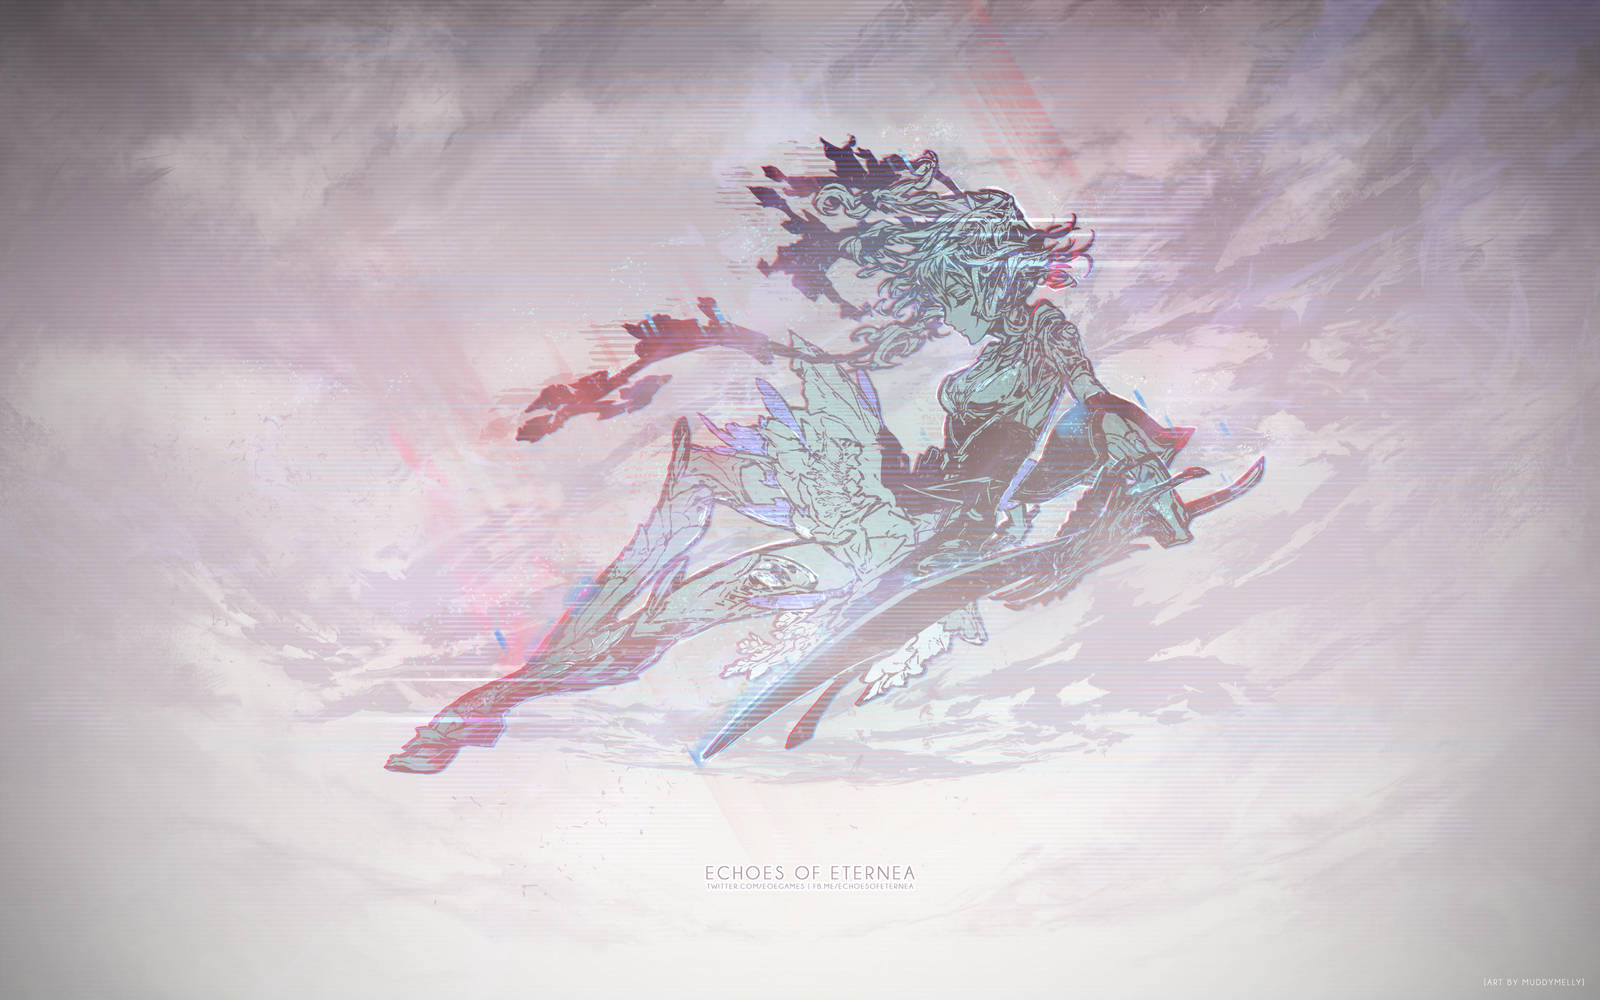 Echoes of Eternea: Namie Logo, Glitched by muddymelly